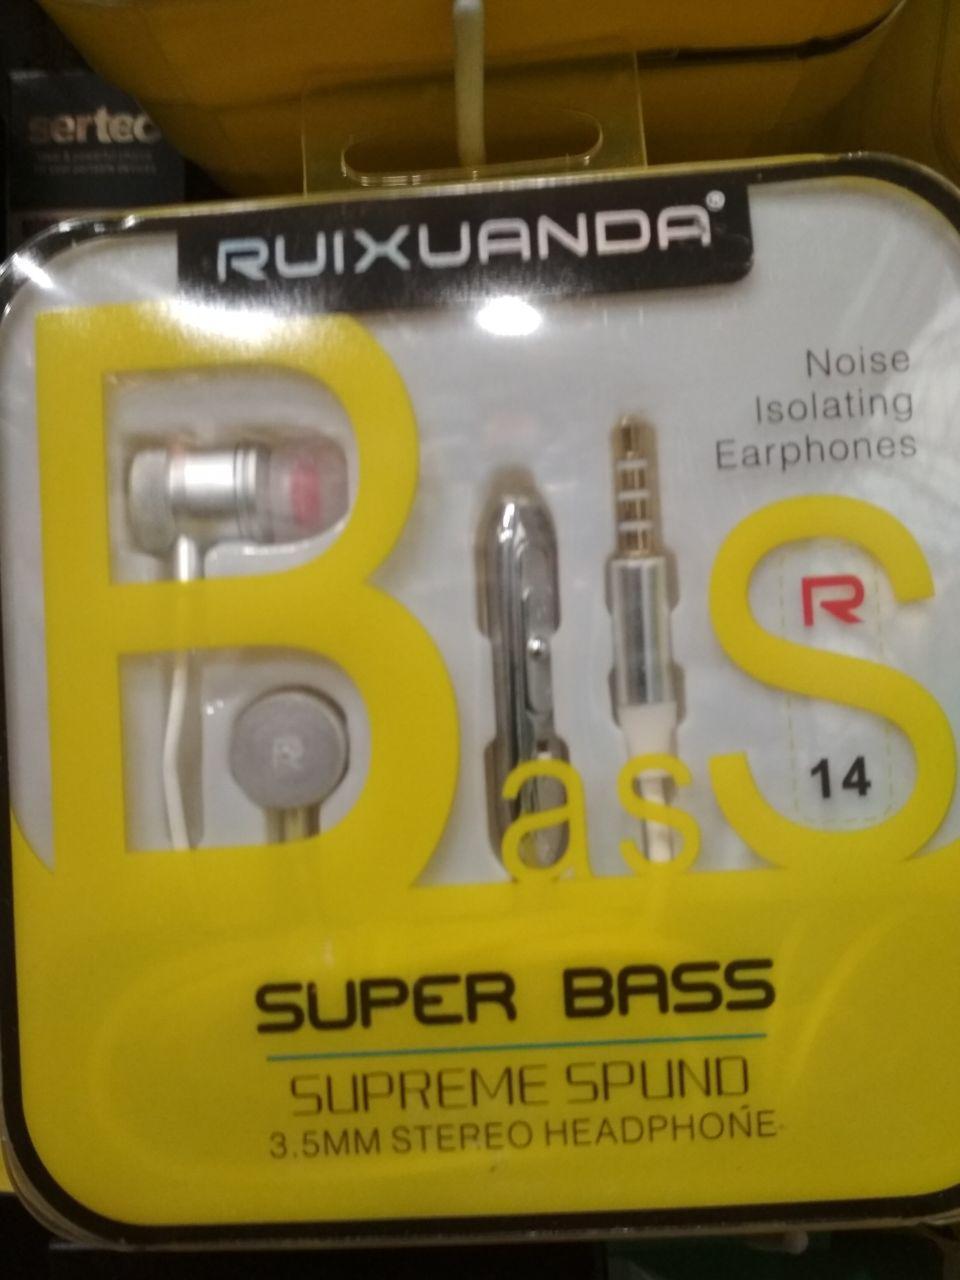 Наушники с гарнитурой Ruixuanda R14